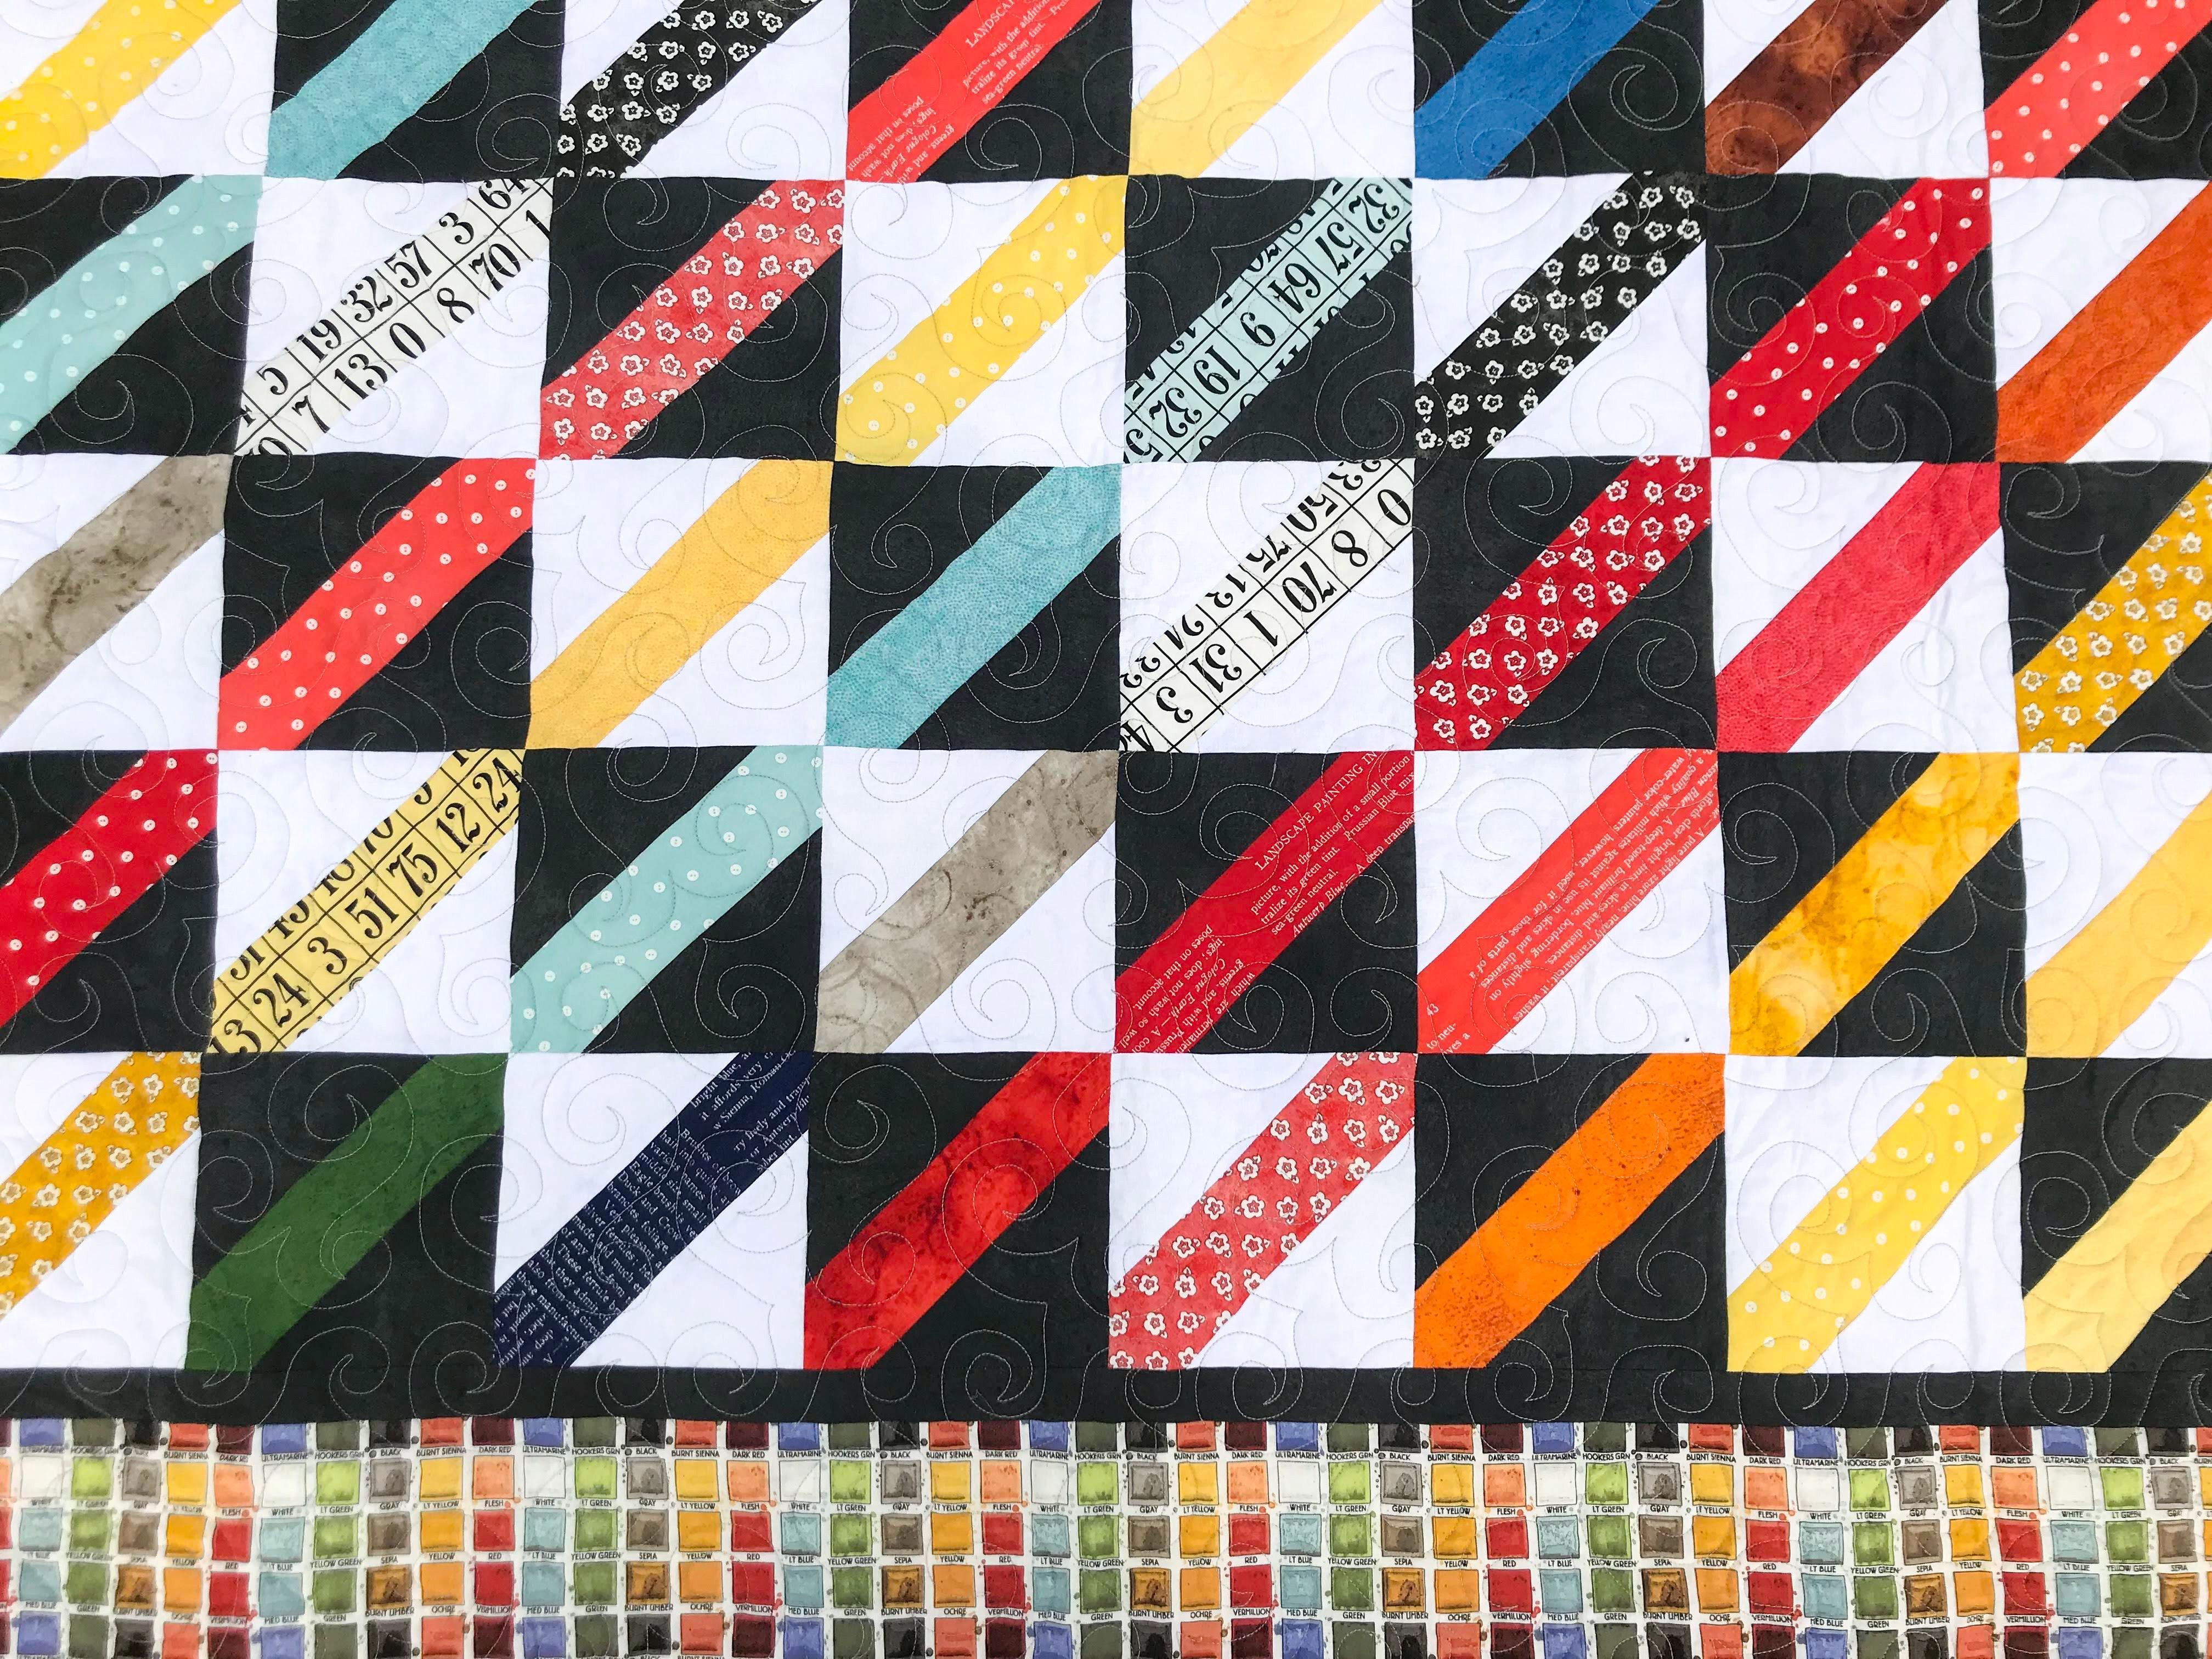 Painter's Palette – Paint by Row Quilt